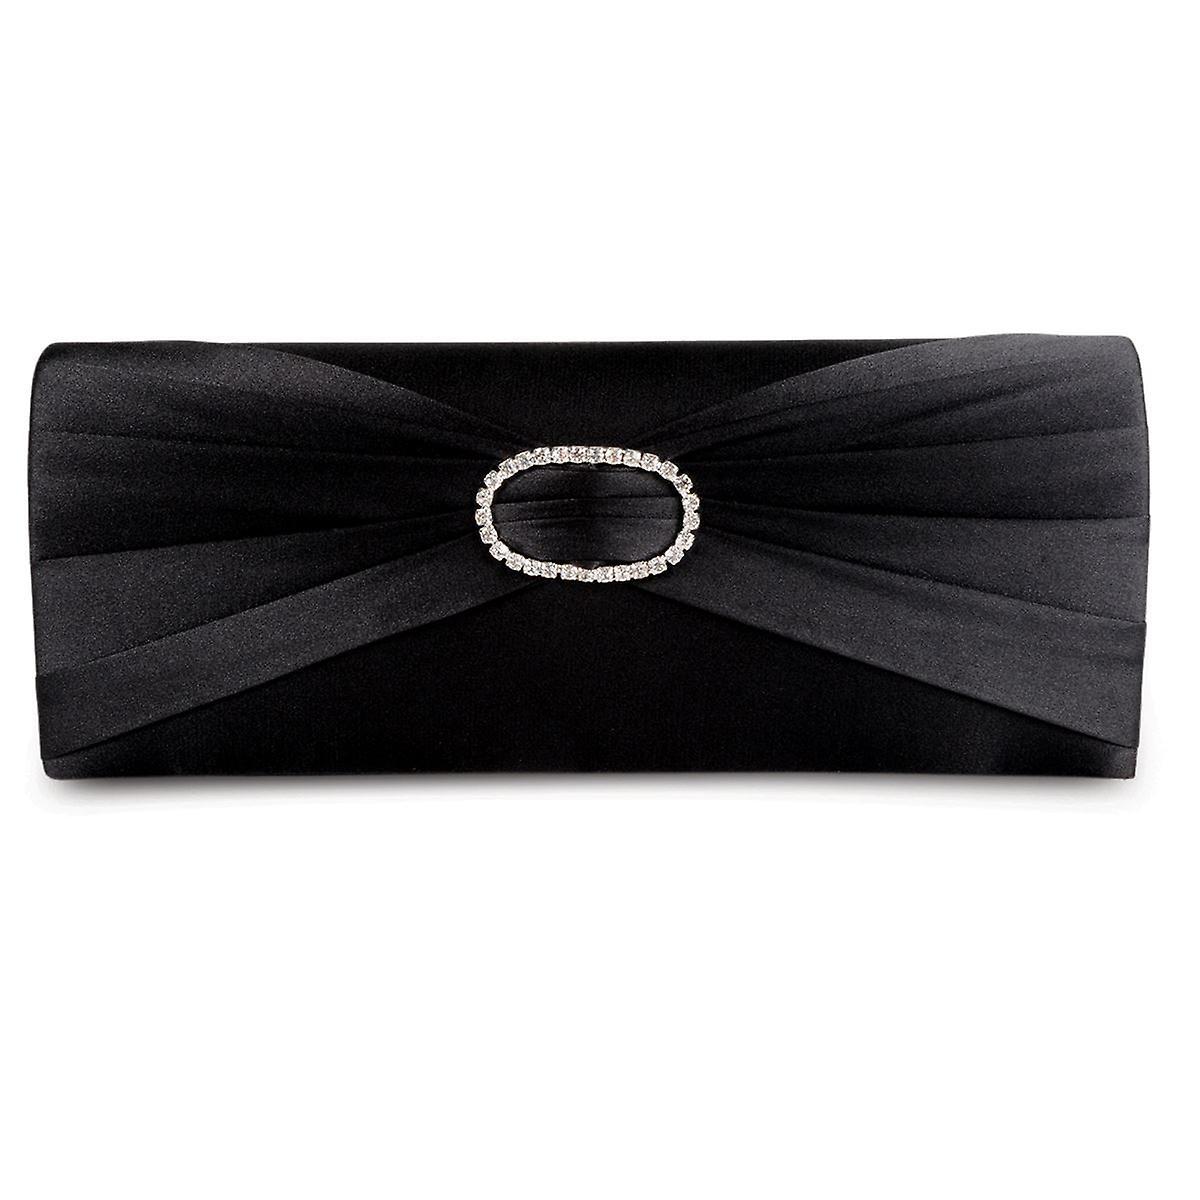 Ladies Low Heel Diamante Ruffle Effect Women's Smart Shoes Clutch Bag